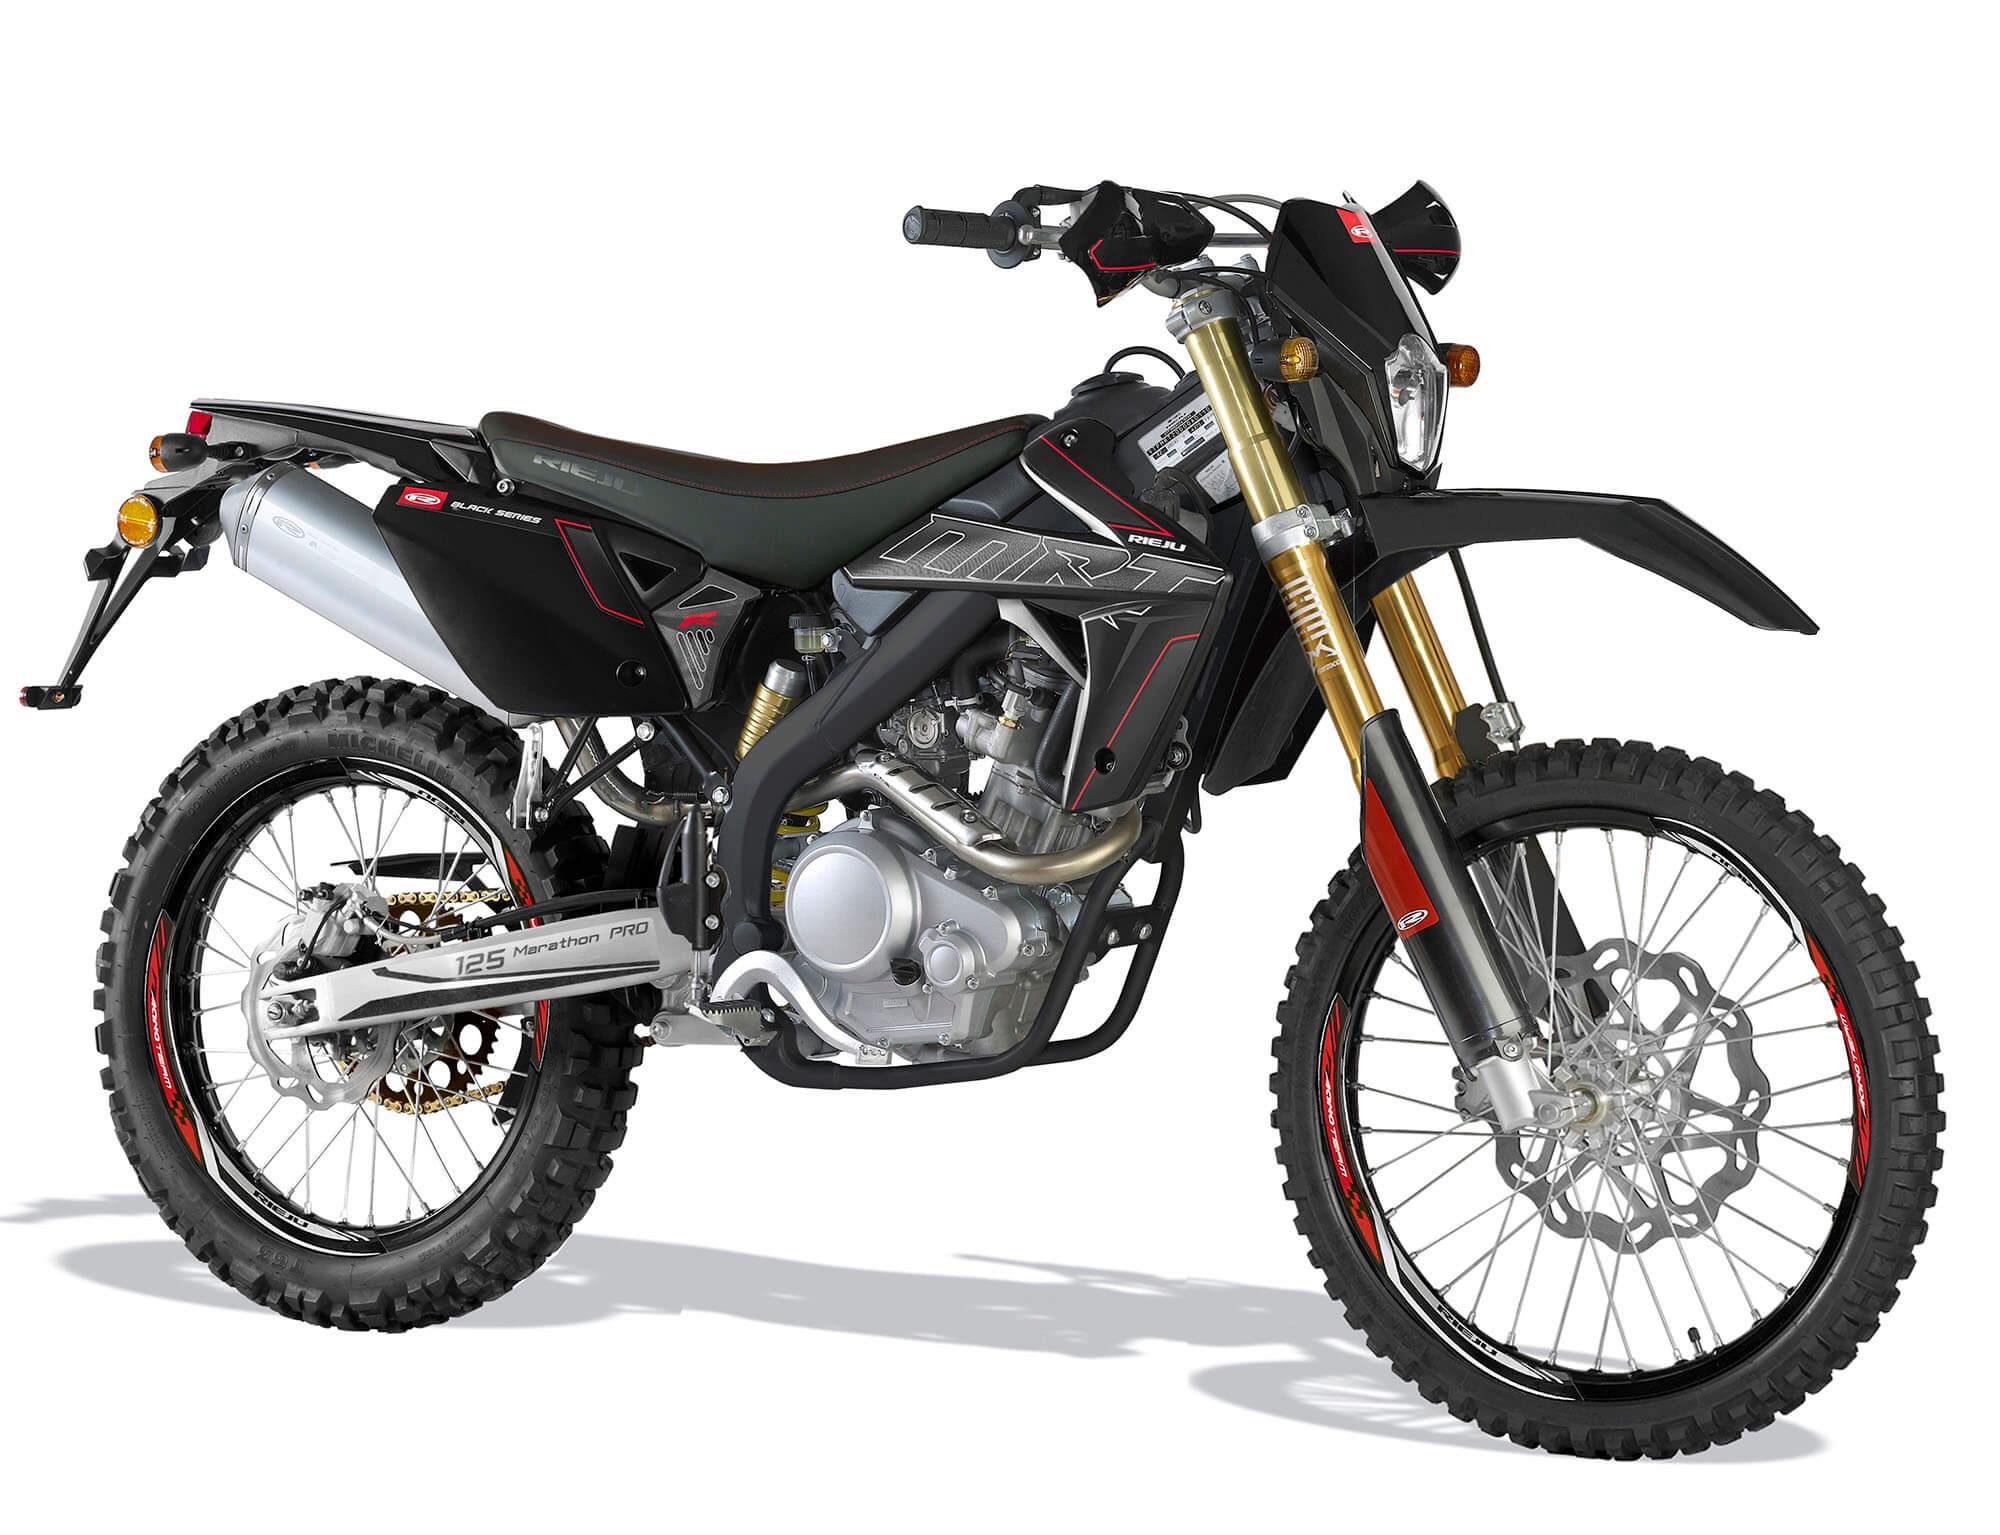 comprar-motos-rieju-marathon-pro-125-negro-motissimo-barcelona